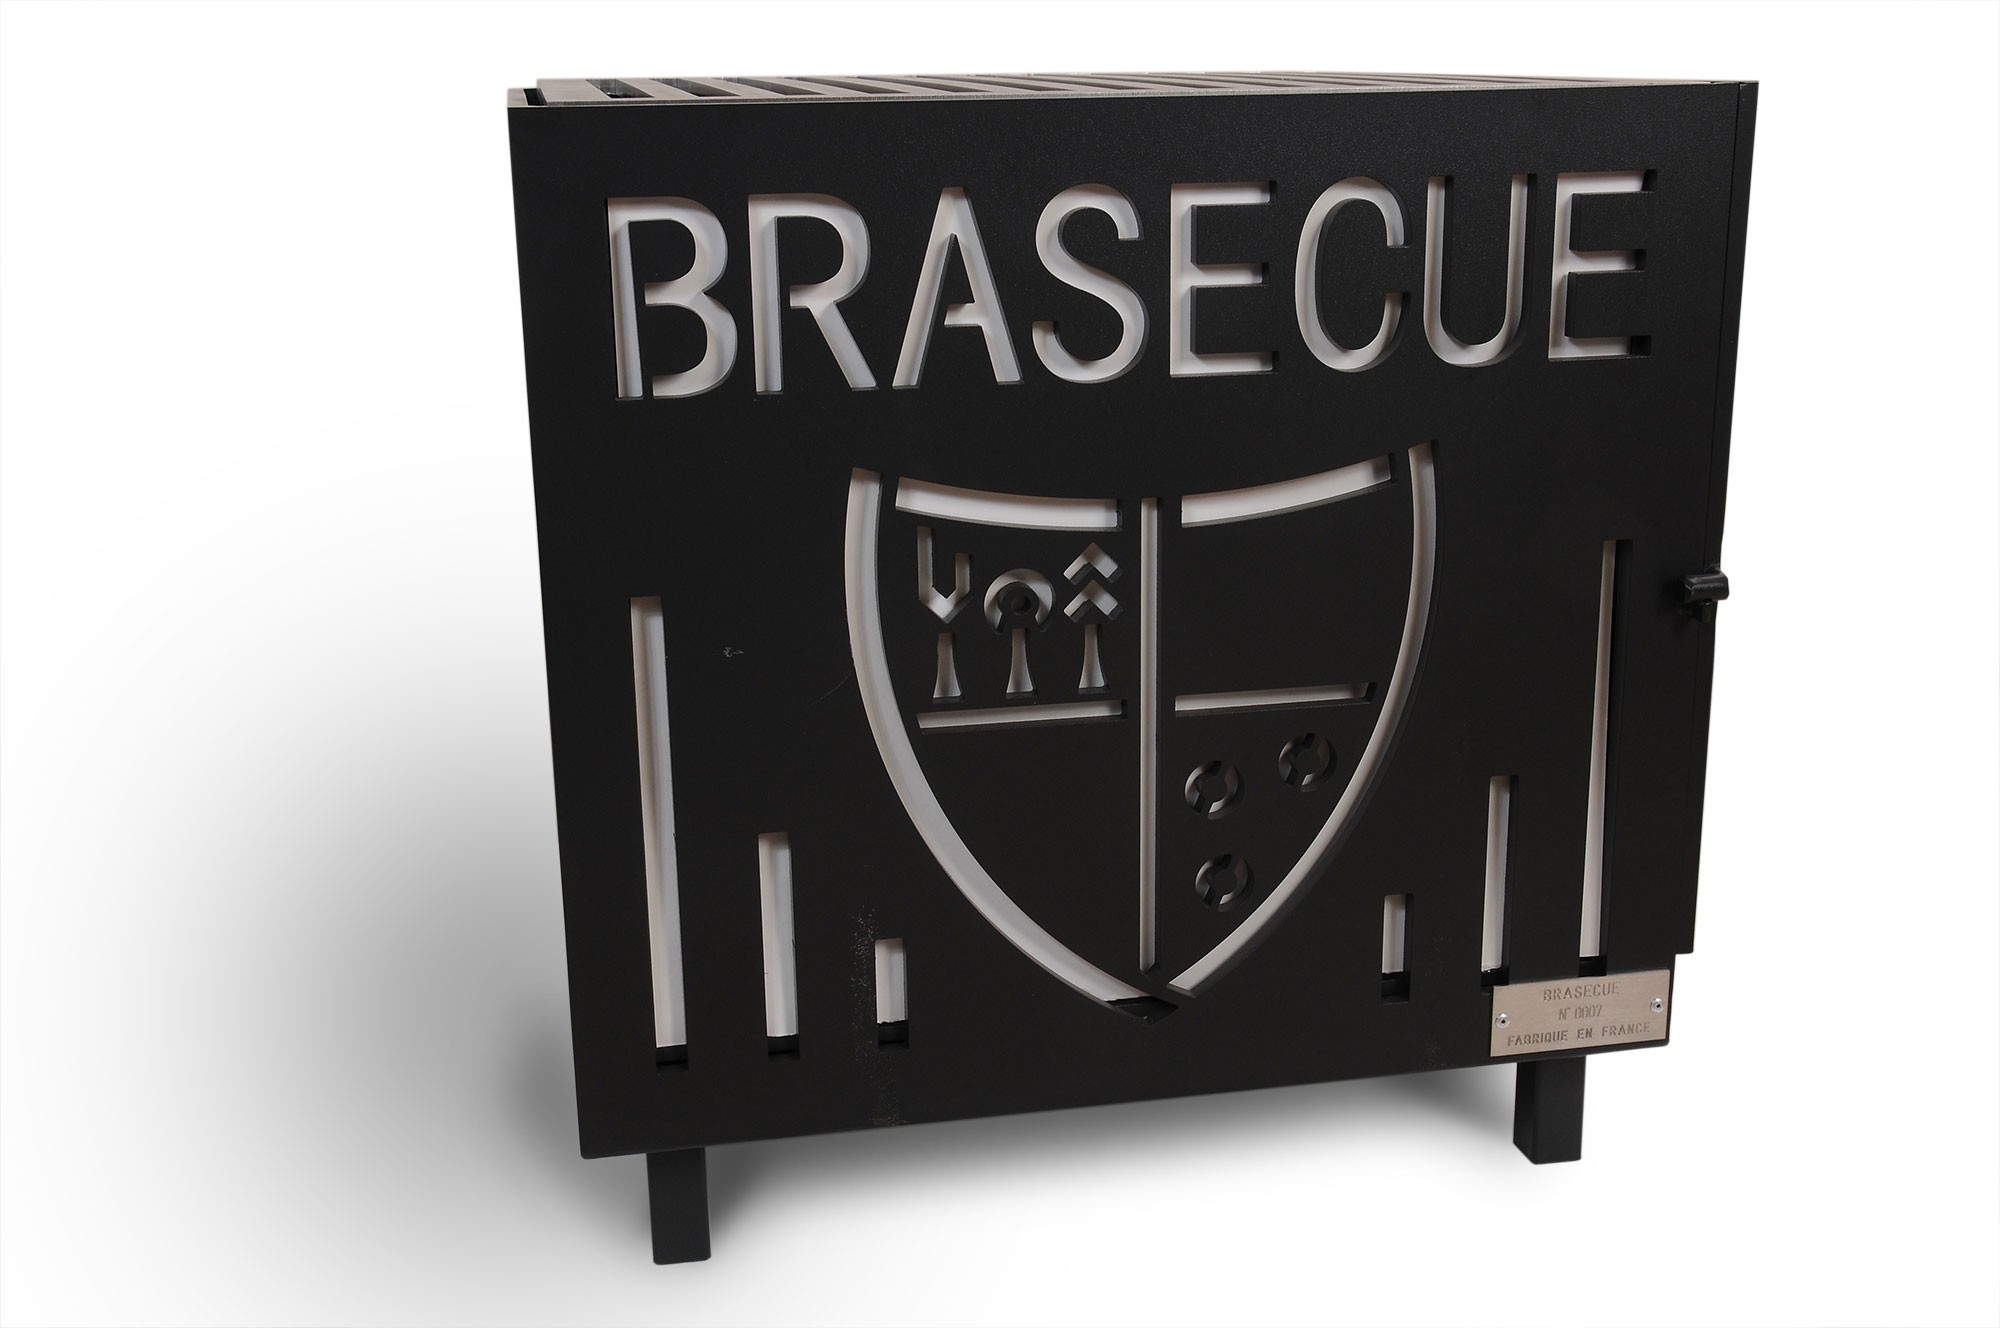 Le Brasecue